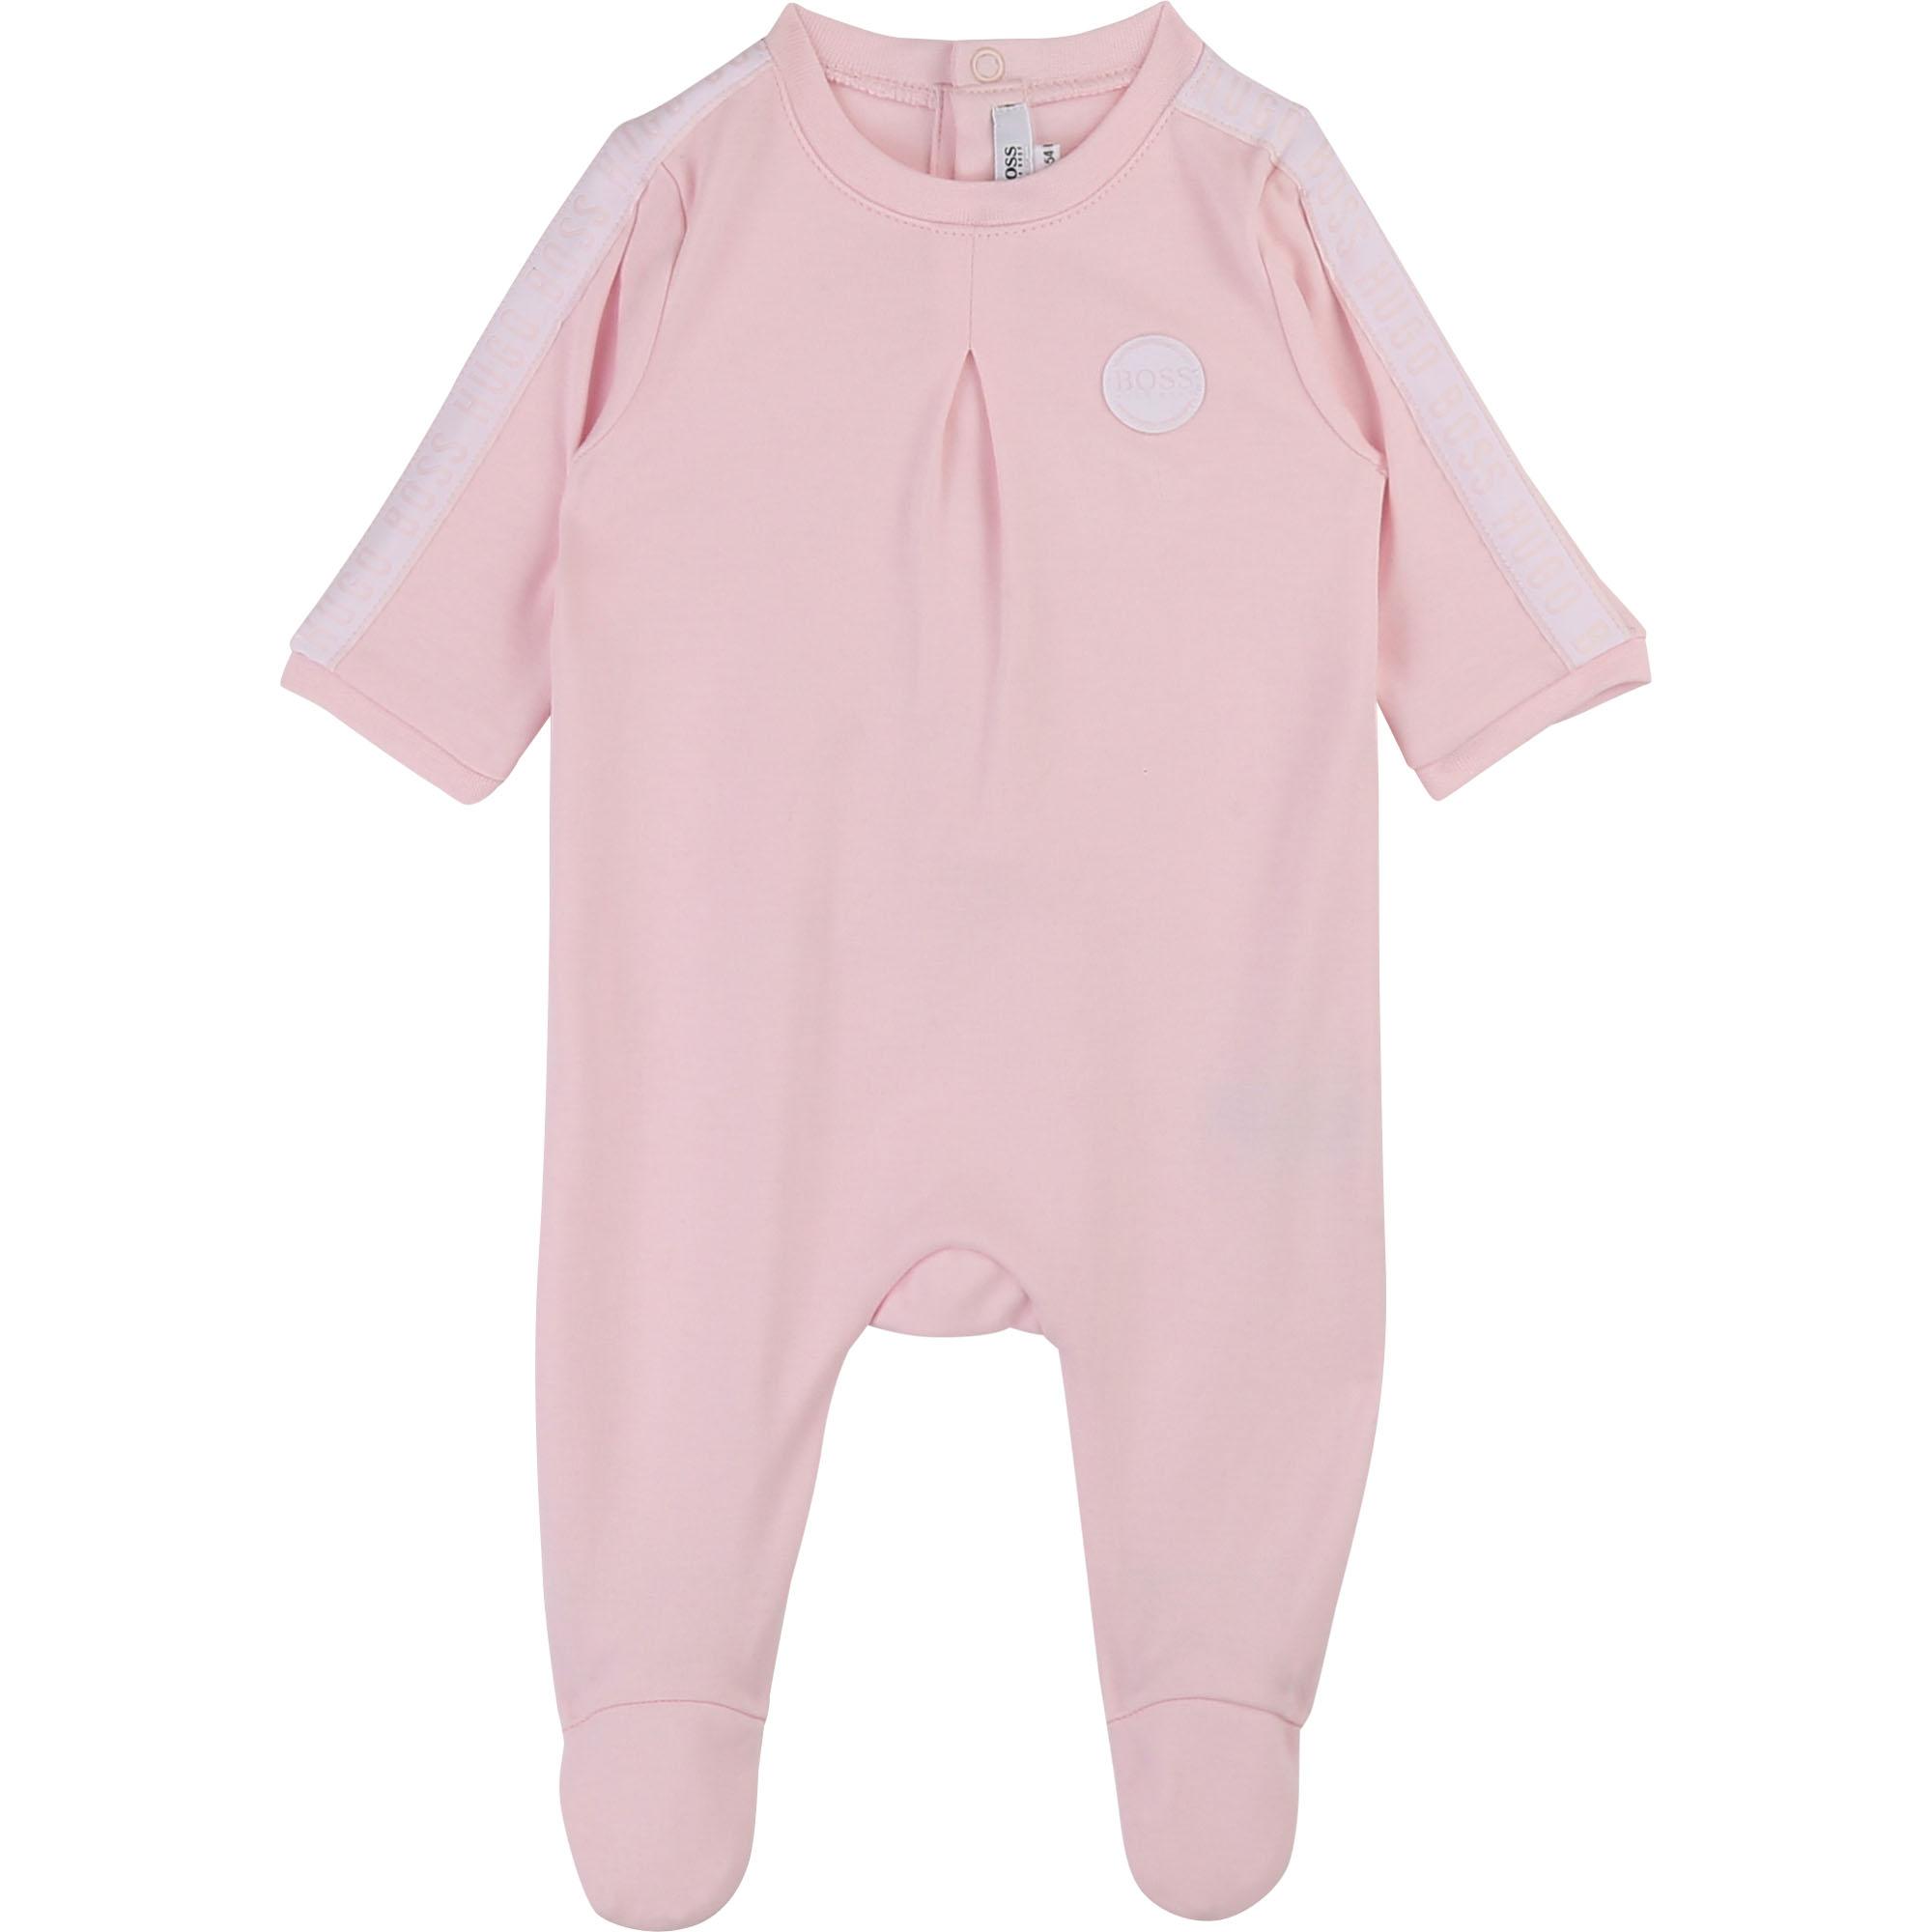 Pyjama en coton interlock BOSS BEBE COUCHE FILLE Rose